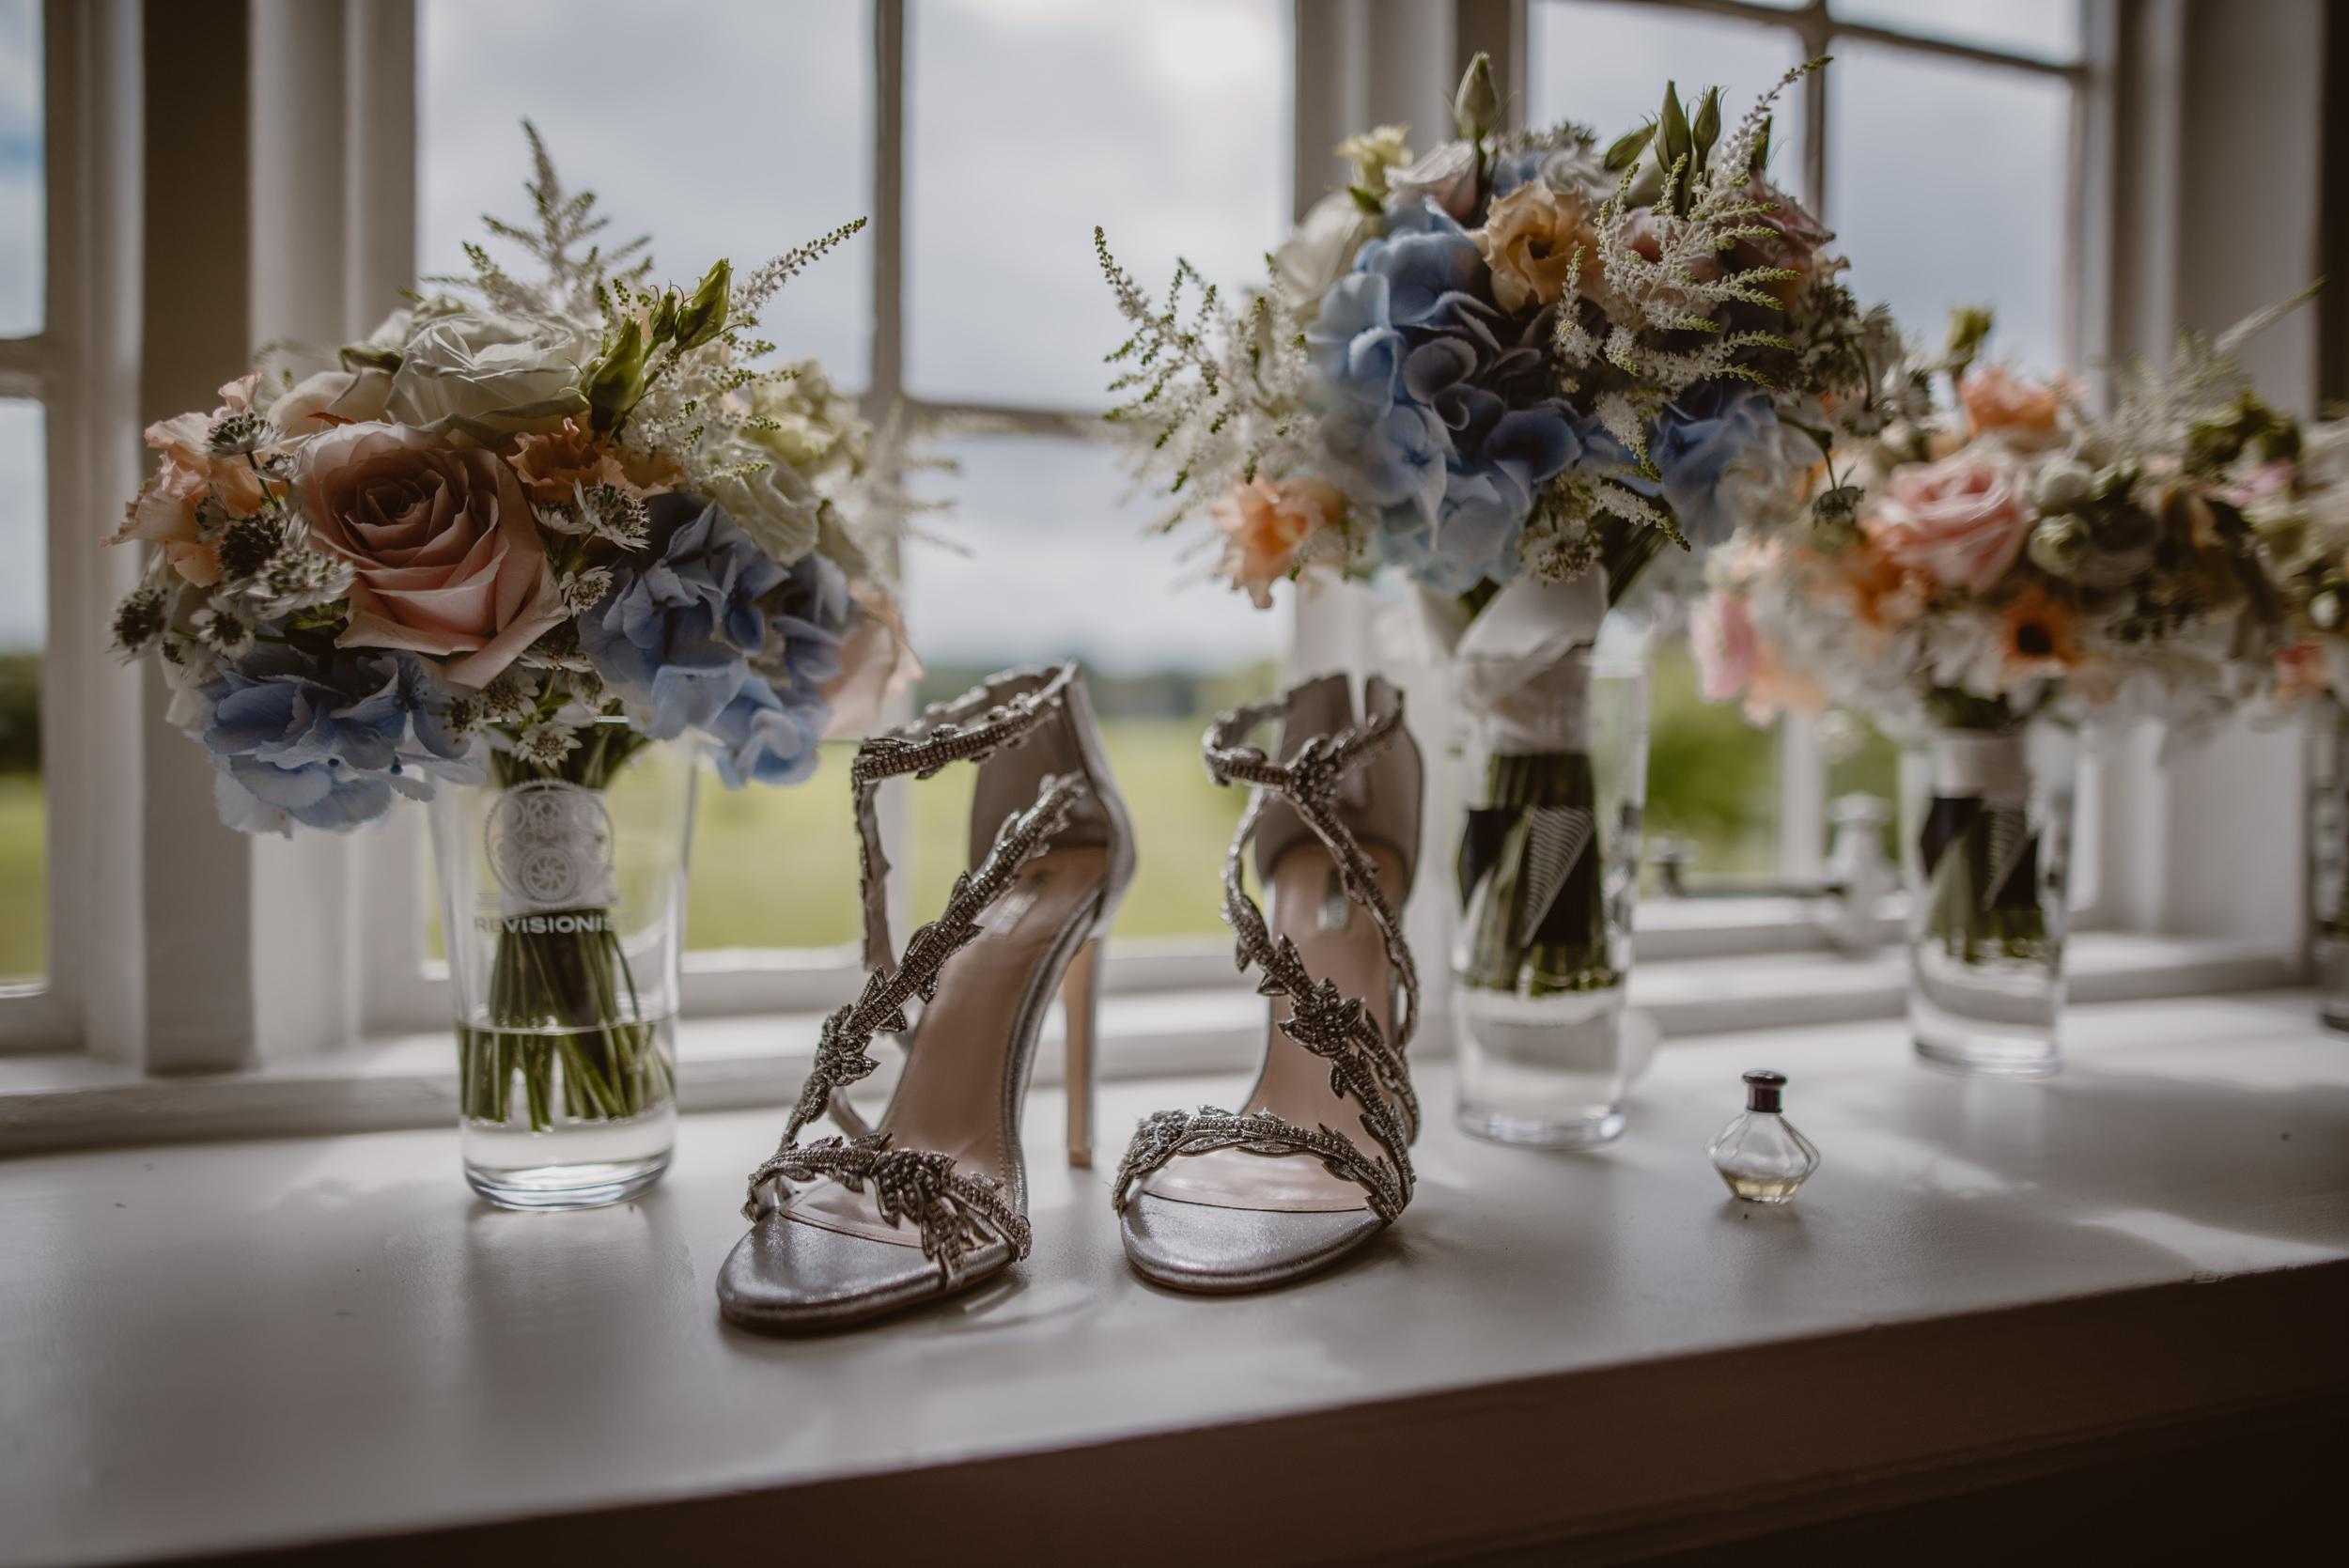 Rachel-and-James-Wedding-Horsley-Towers-State-Manu-Mendoza-Wedding-Photography-151.jpg